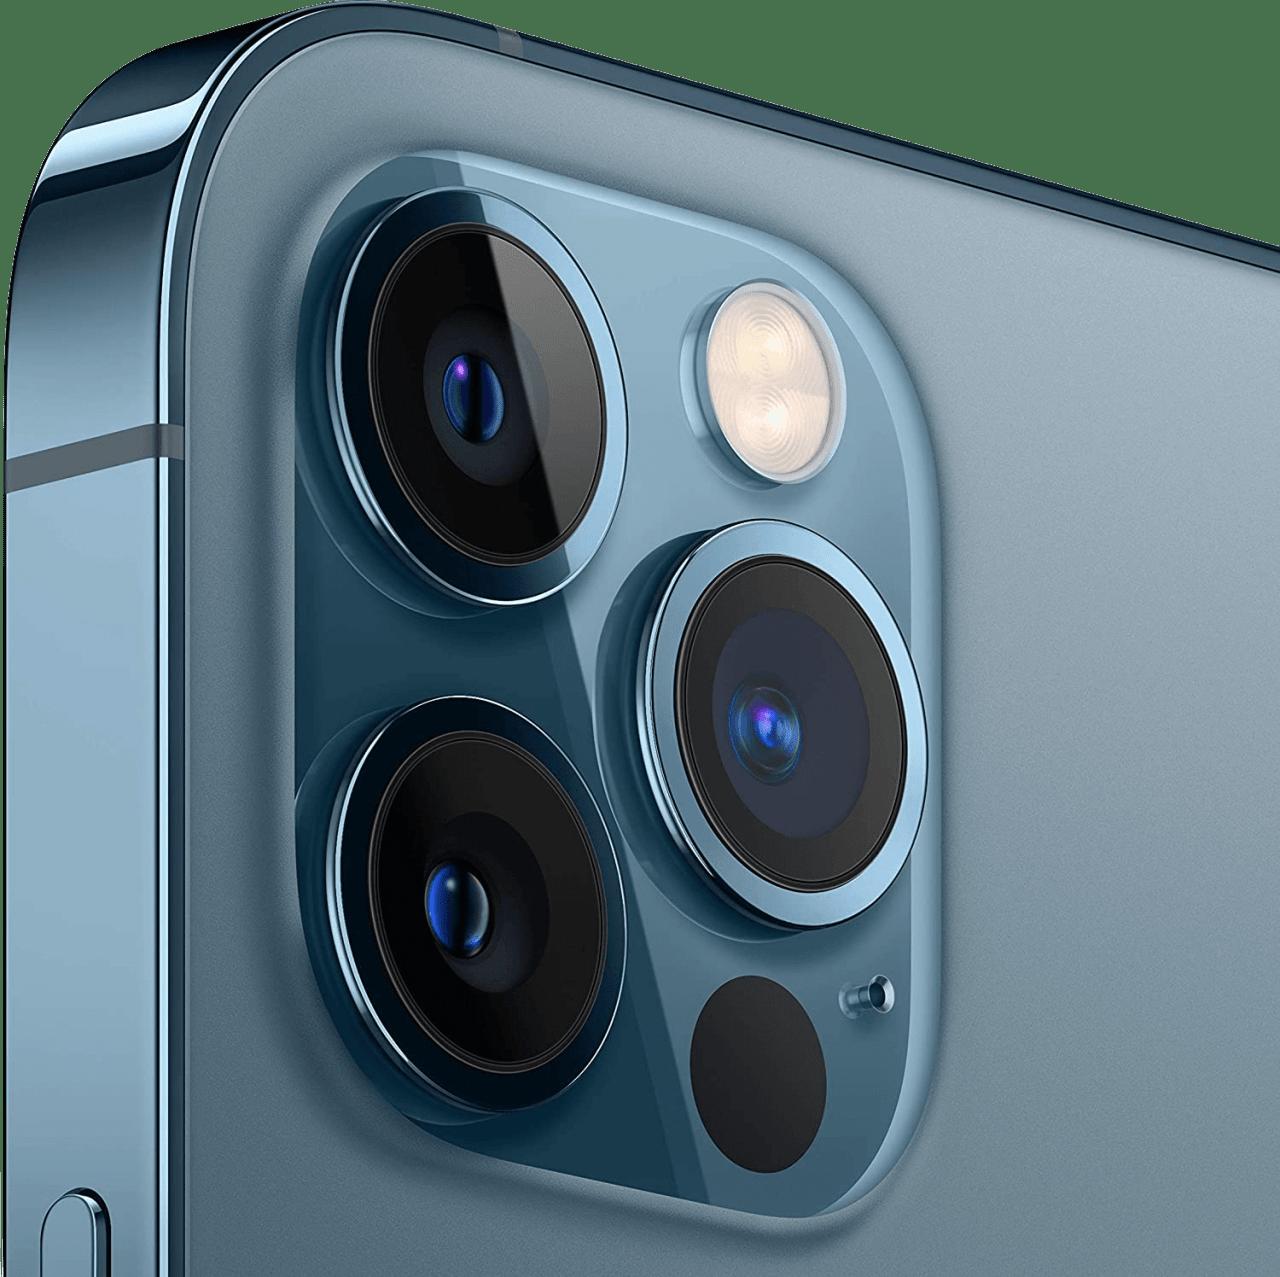 Blau Apple iPhone 12 Pro Max 512GB.2